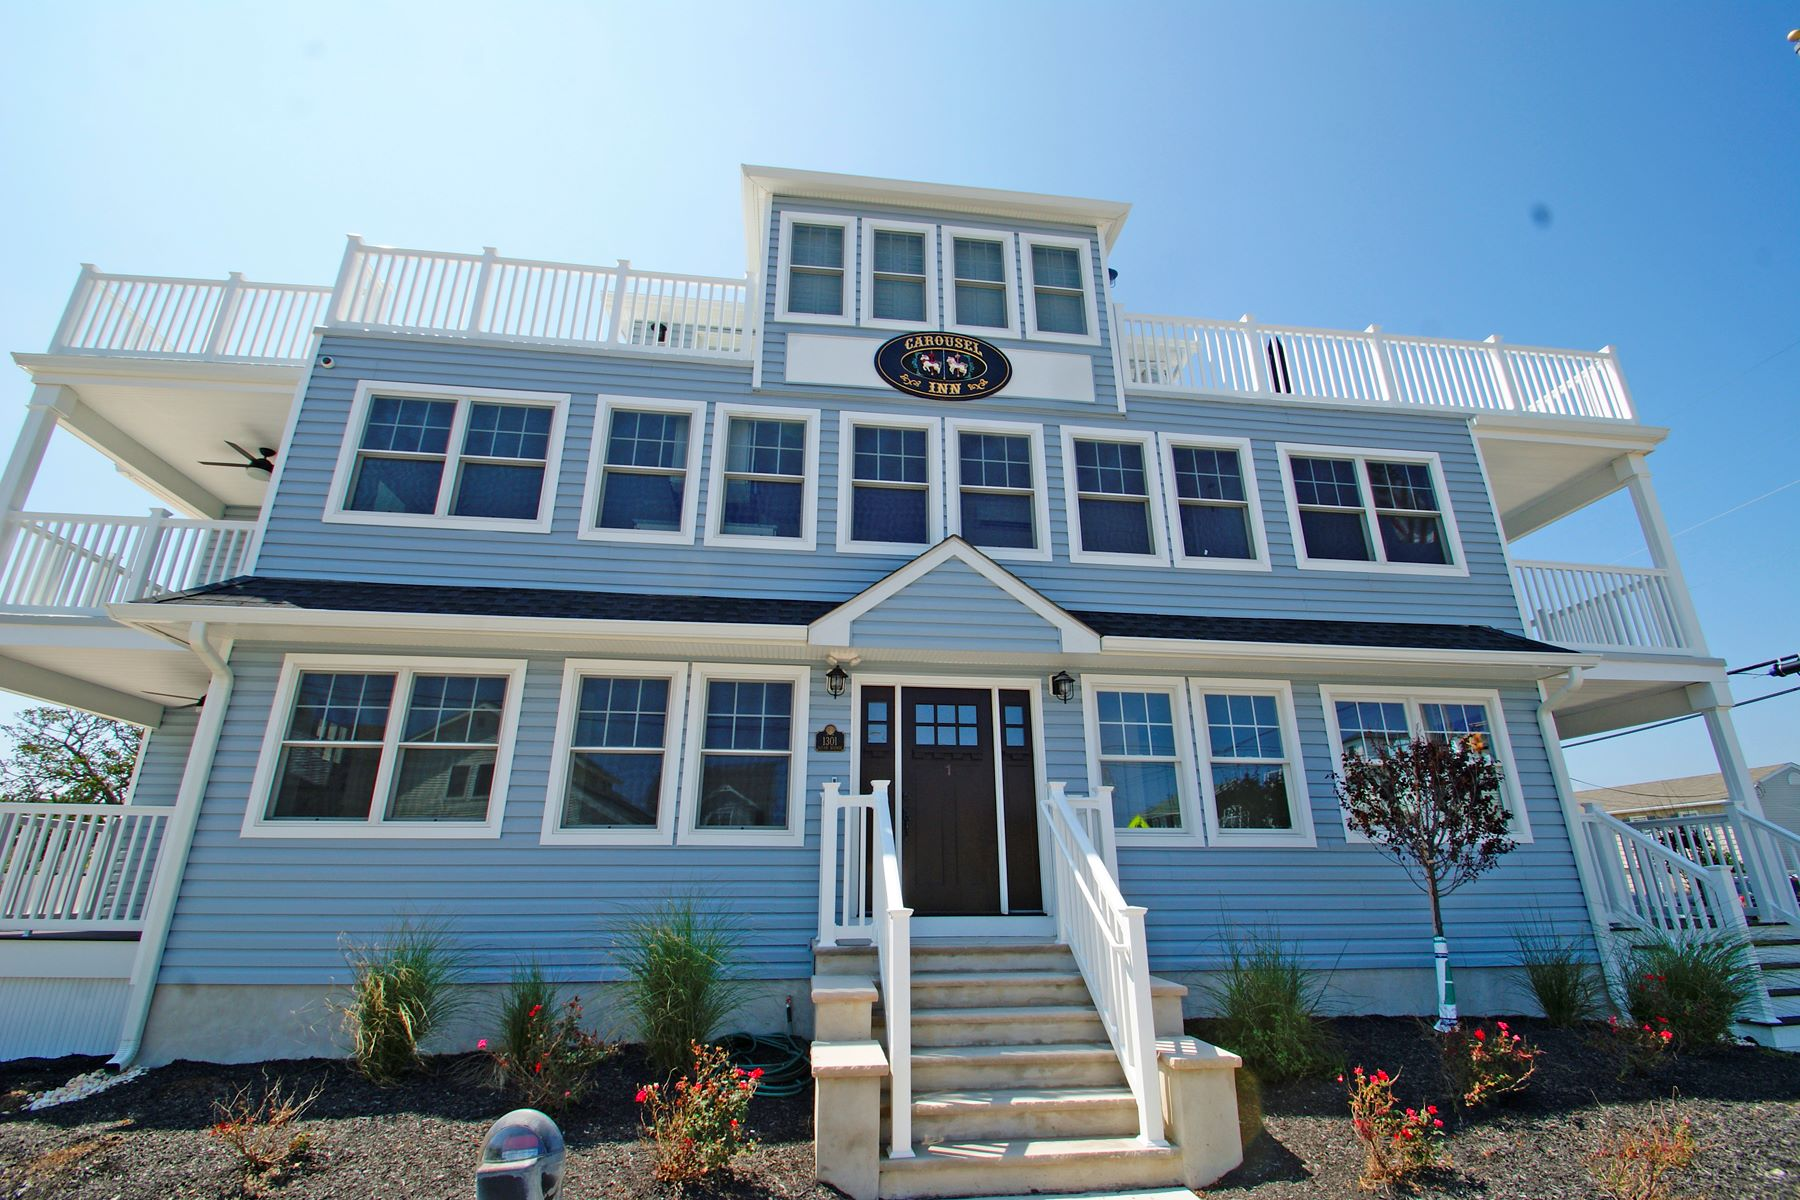 Condominiums для того Продажа на One Block To The Ocean 1301 Ocean Avenue Unit #1, Point Pleasant Beach, Нью-Джерси 08742 Соединенные Штаты